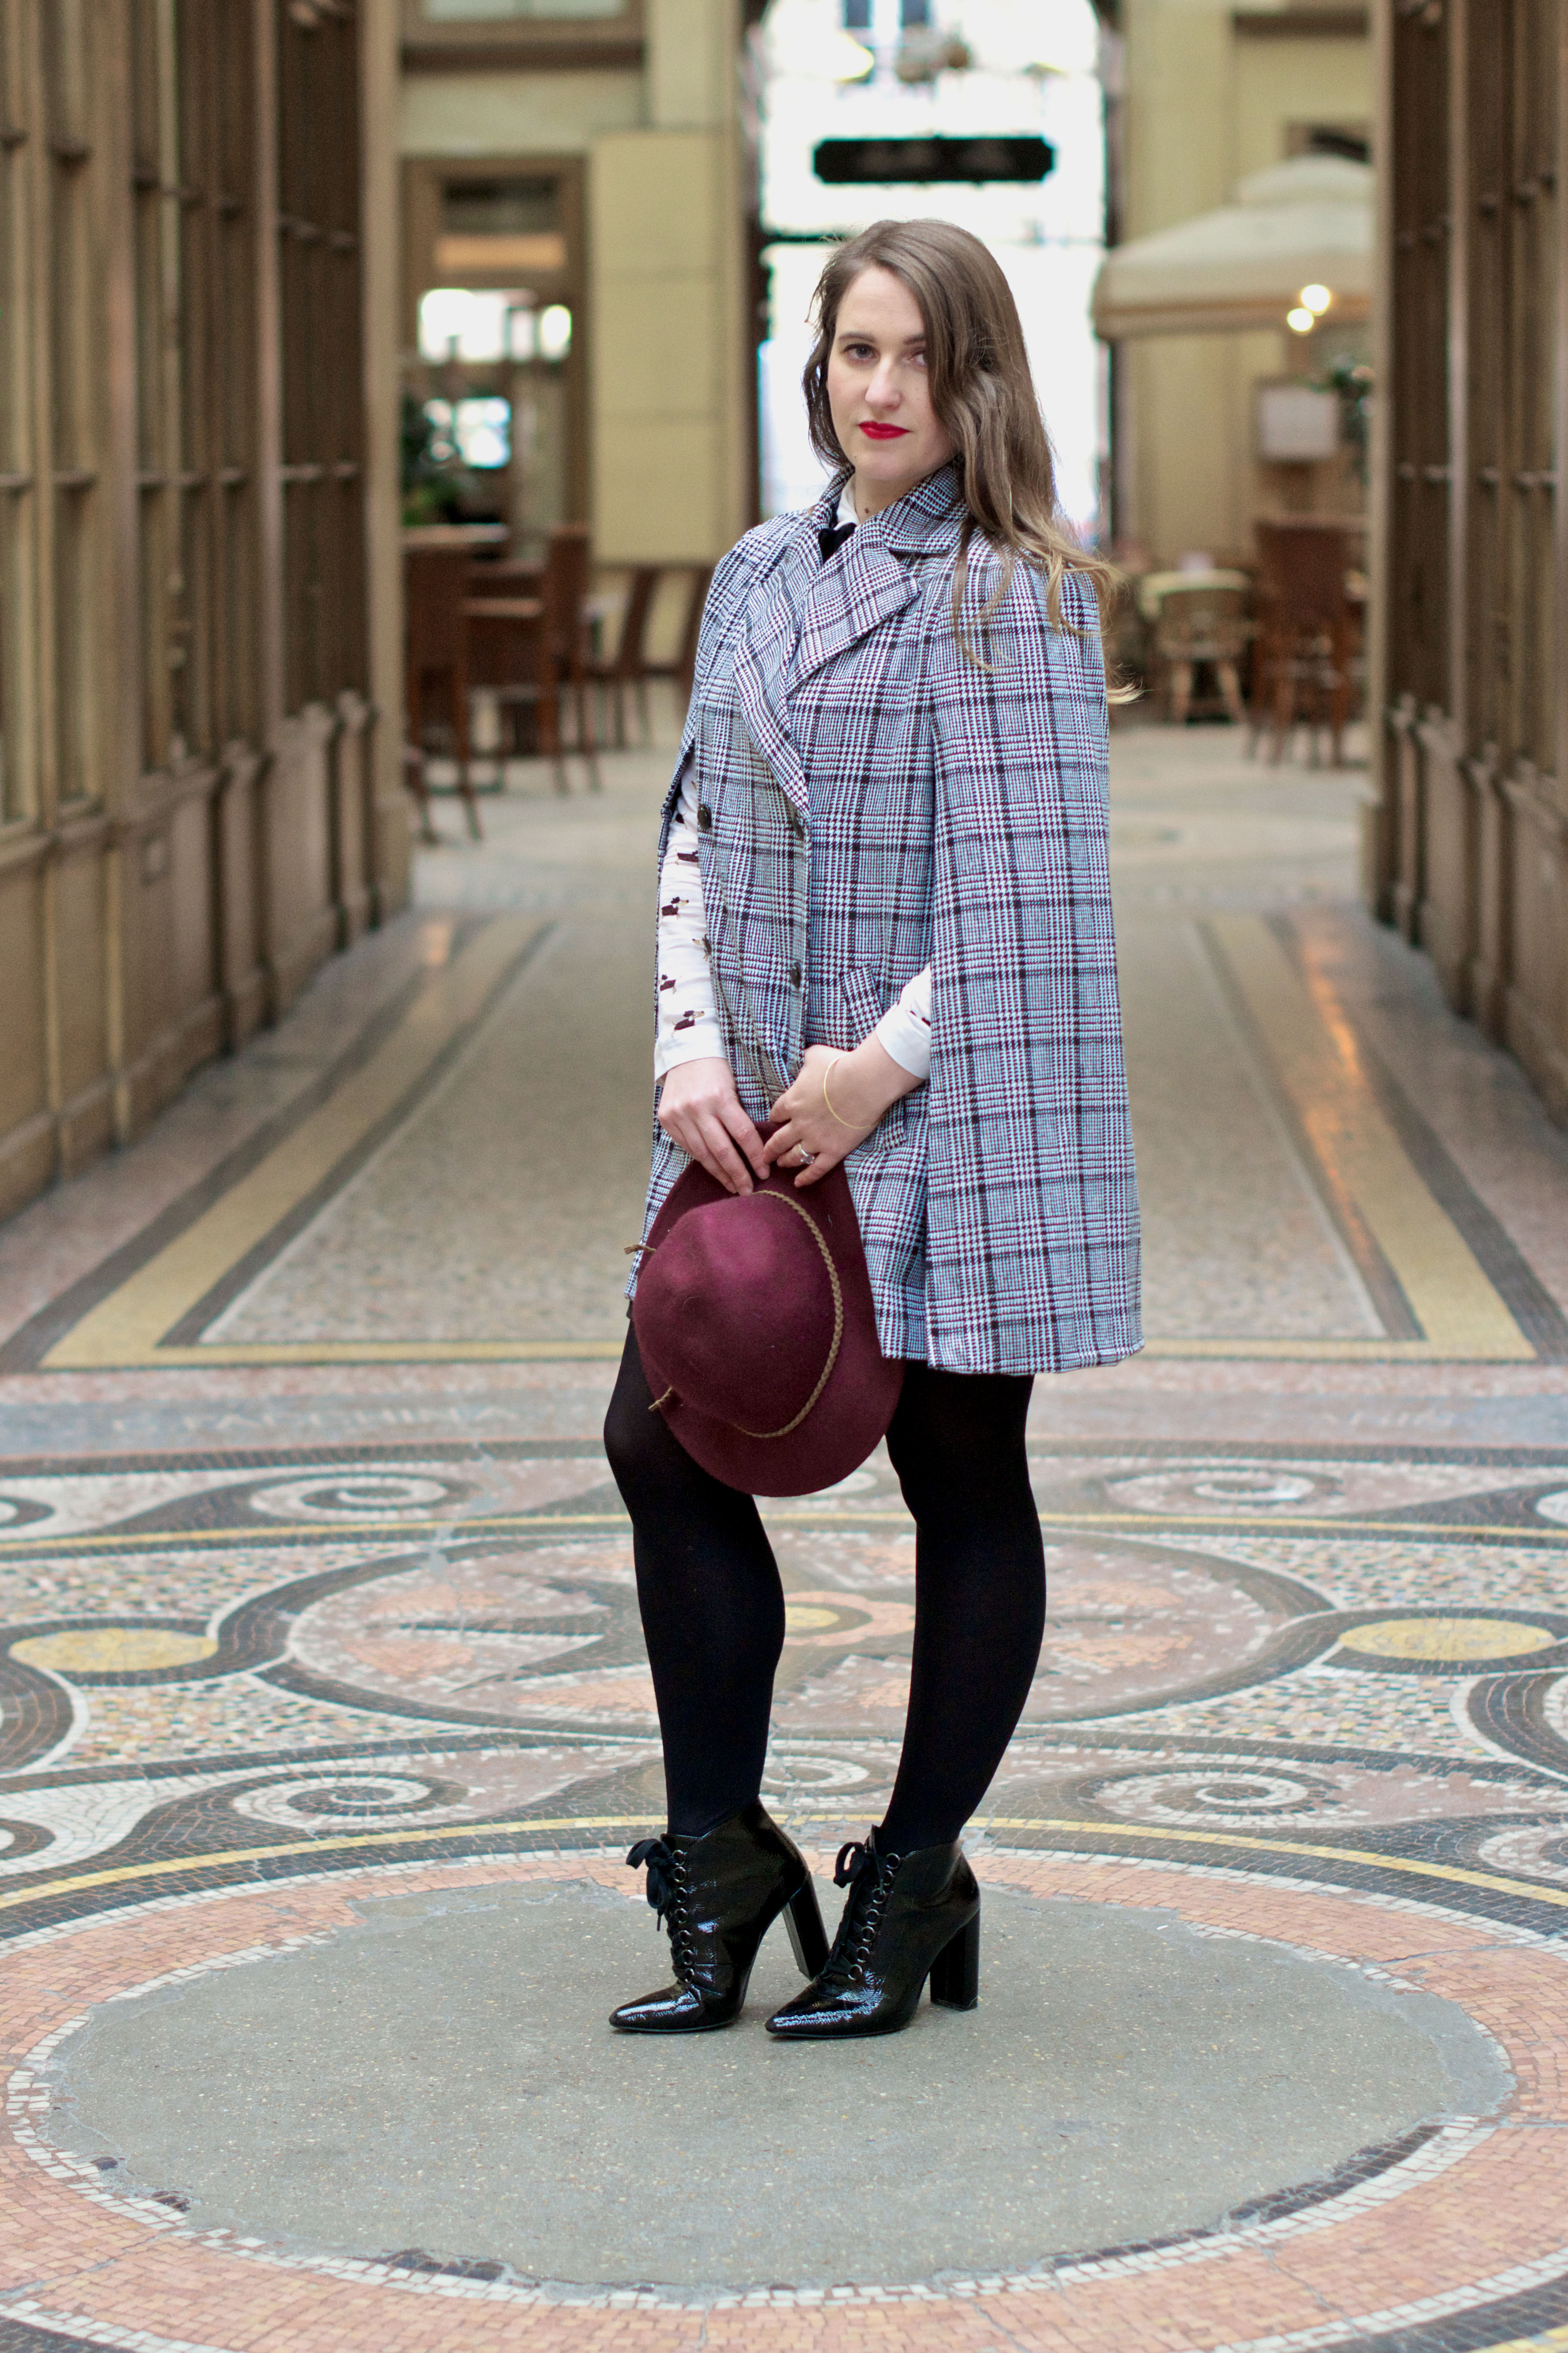 look-preppy-london-capetartan-shein-galeriesvivienne-paris-influencer-fashionblogger-chemiseretro-mango-jupepatineuse-bottineszara-vinyl-seralynepointcom